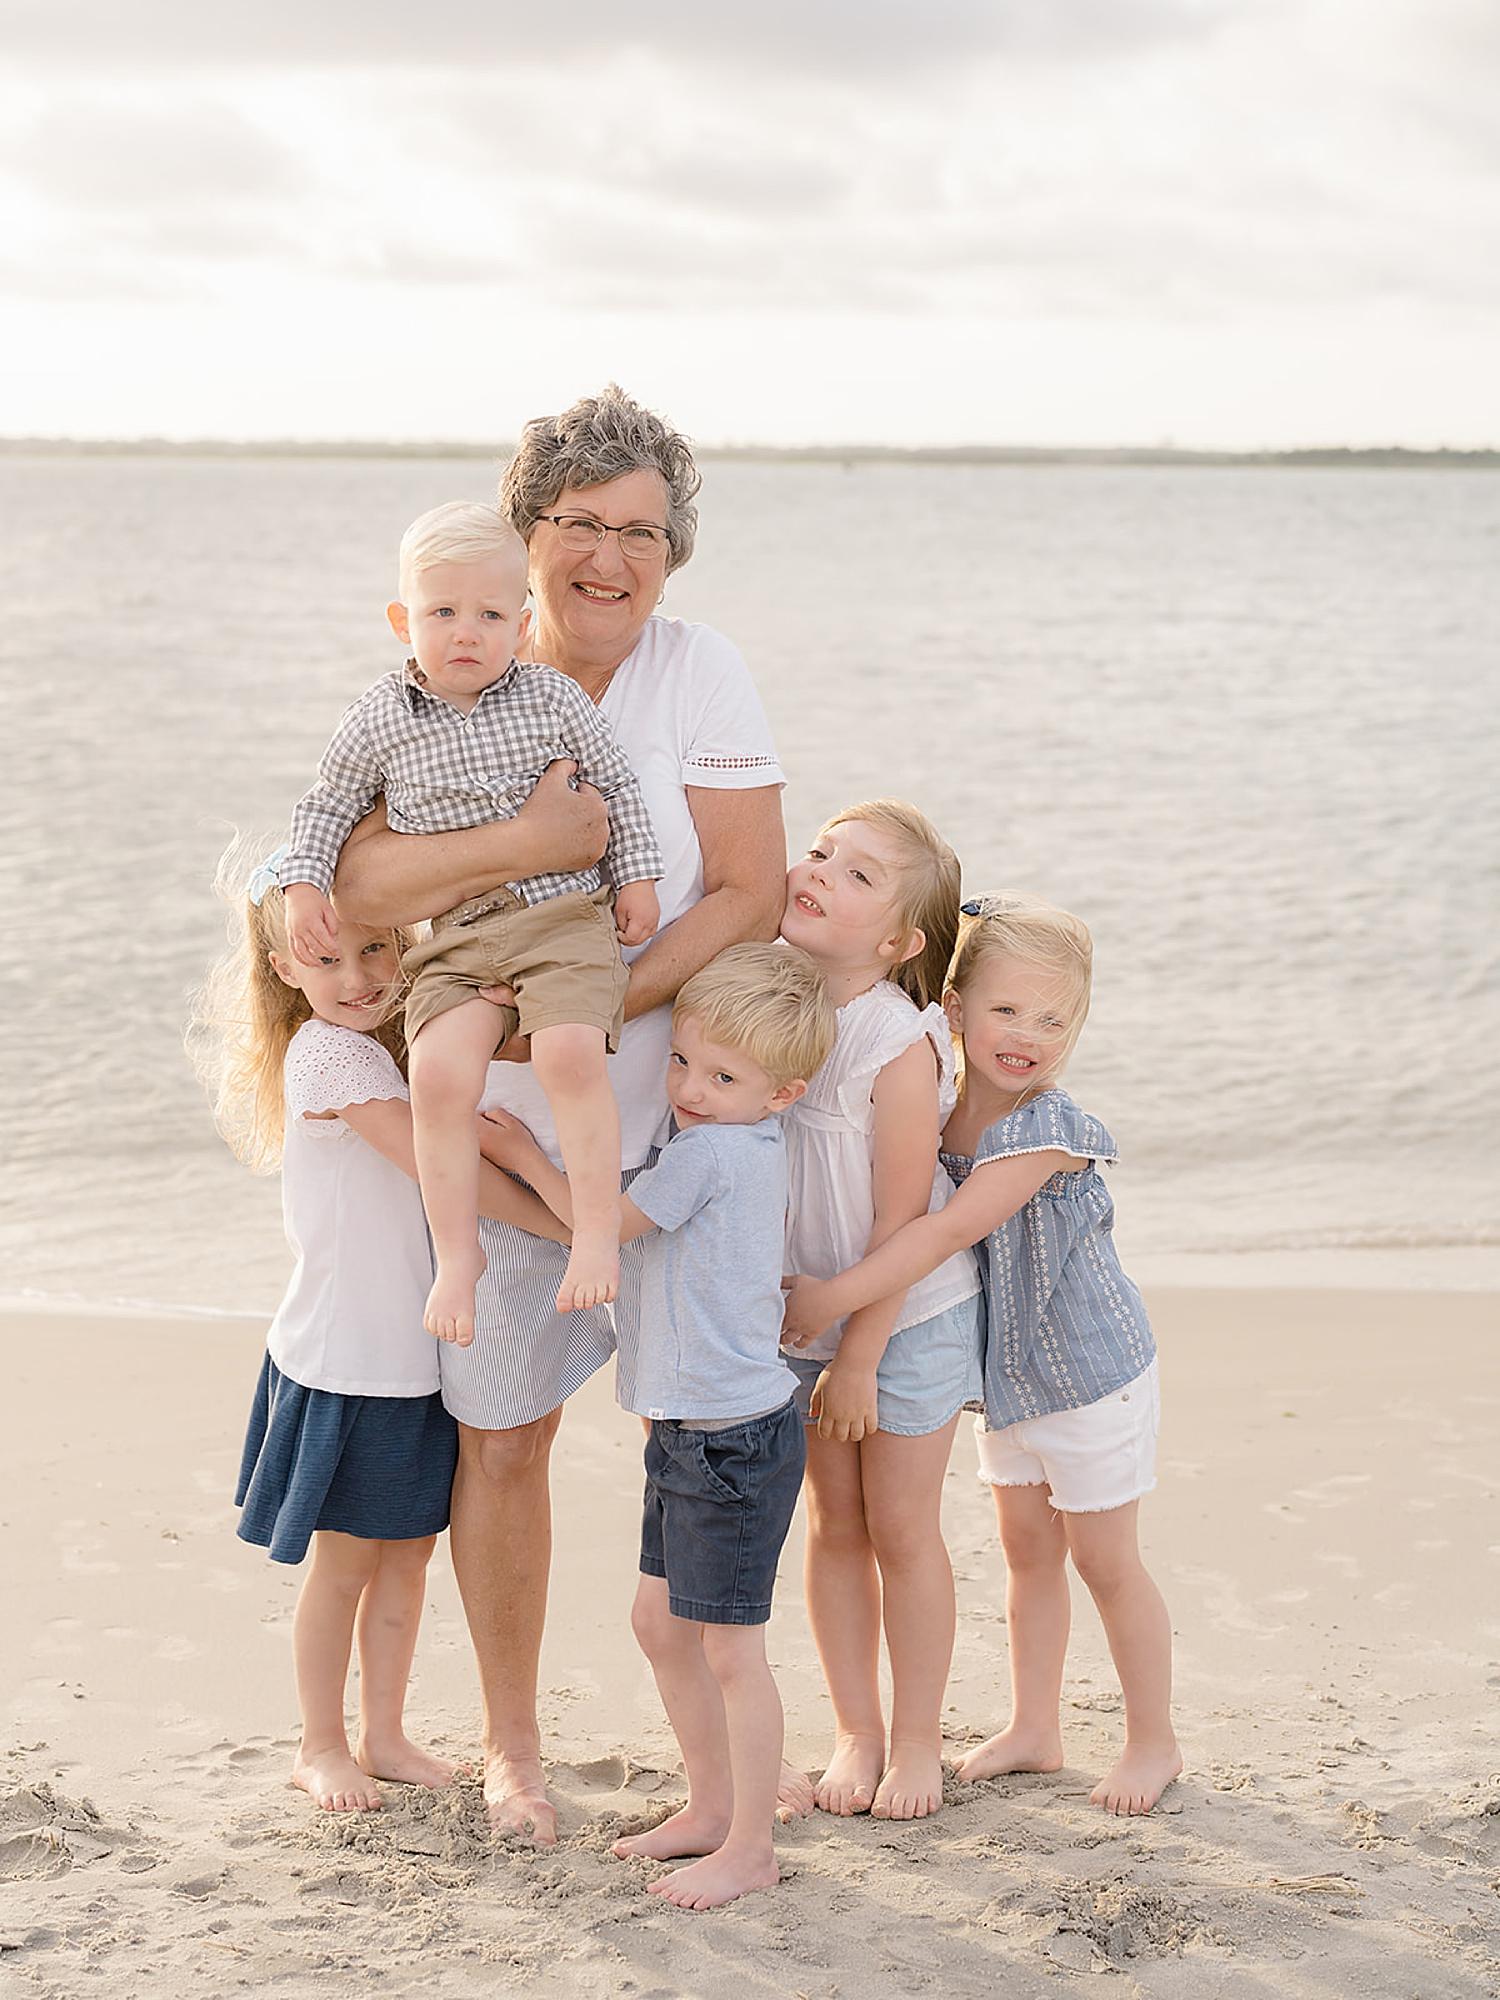 Ocean City Family Photography by Magdalena Studios 0007